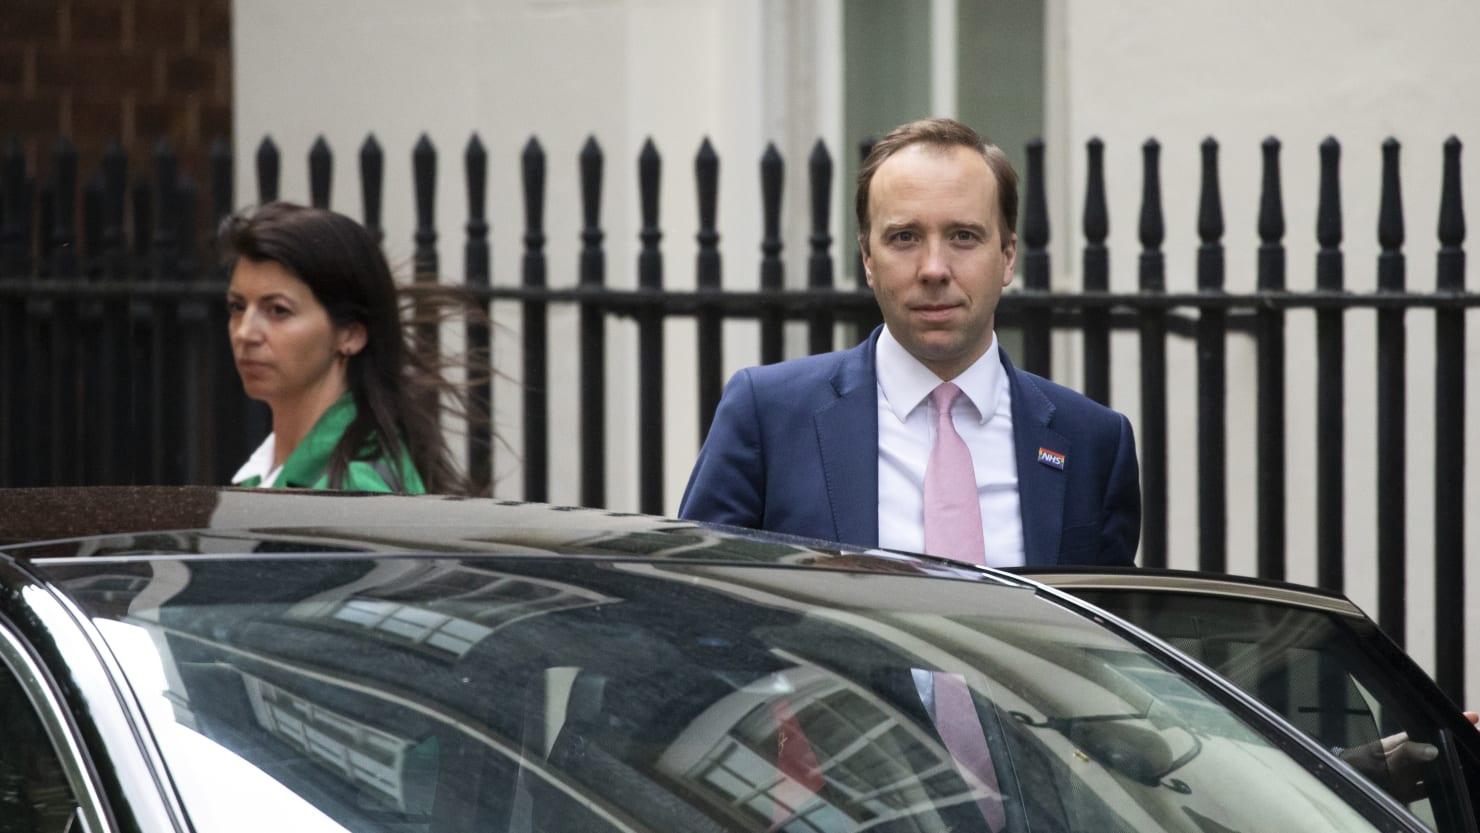 Boris Johnson's 'F*cking Hopeless' Health Secretary Matt Hancock Caught Kissing Aide